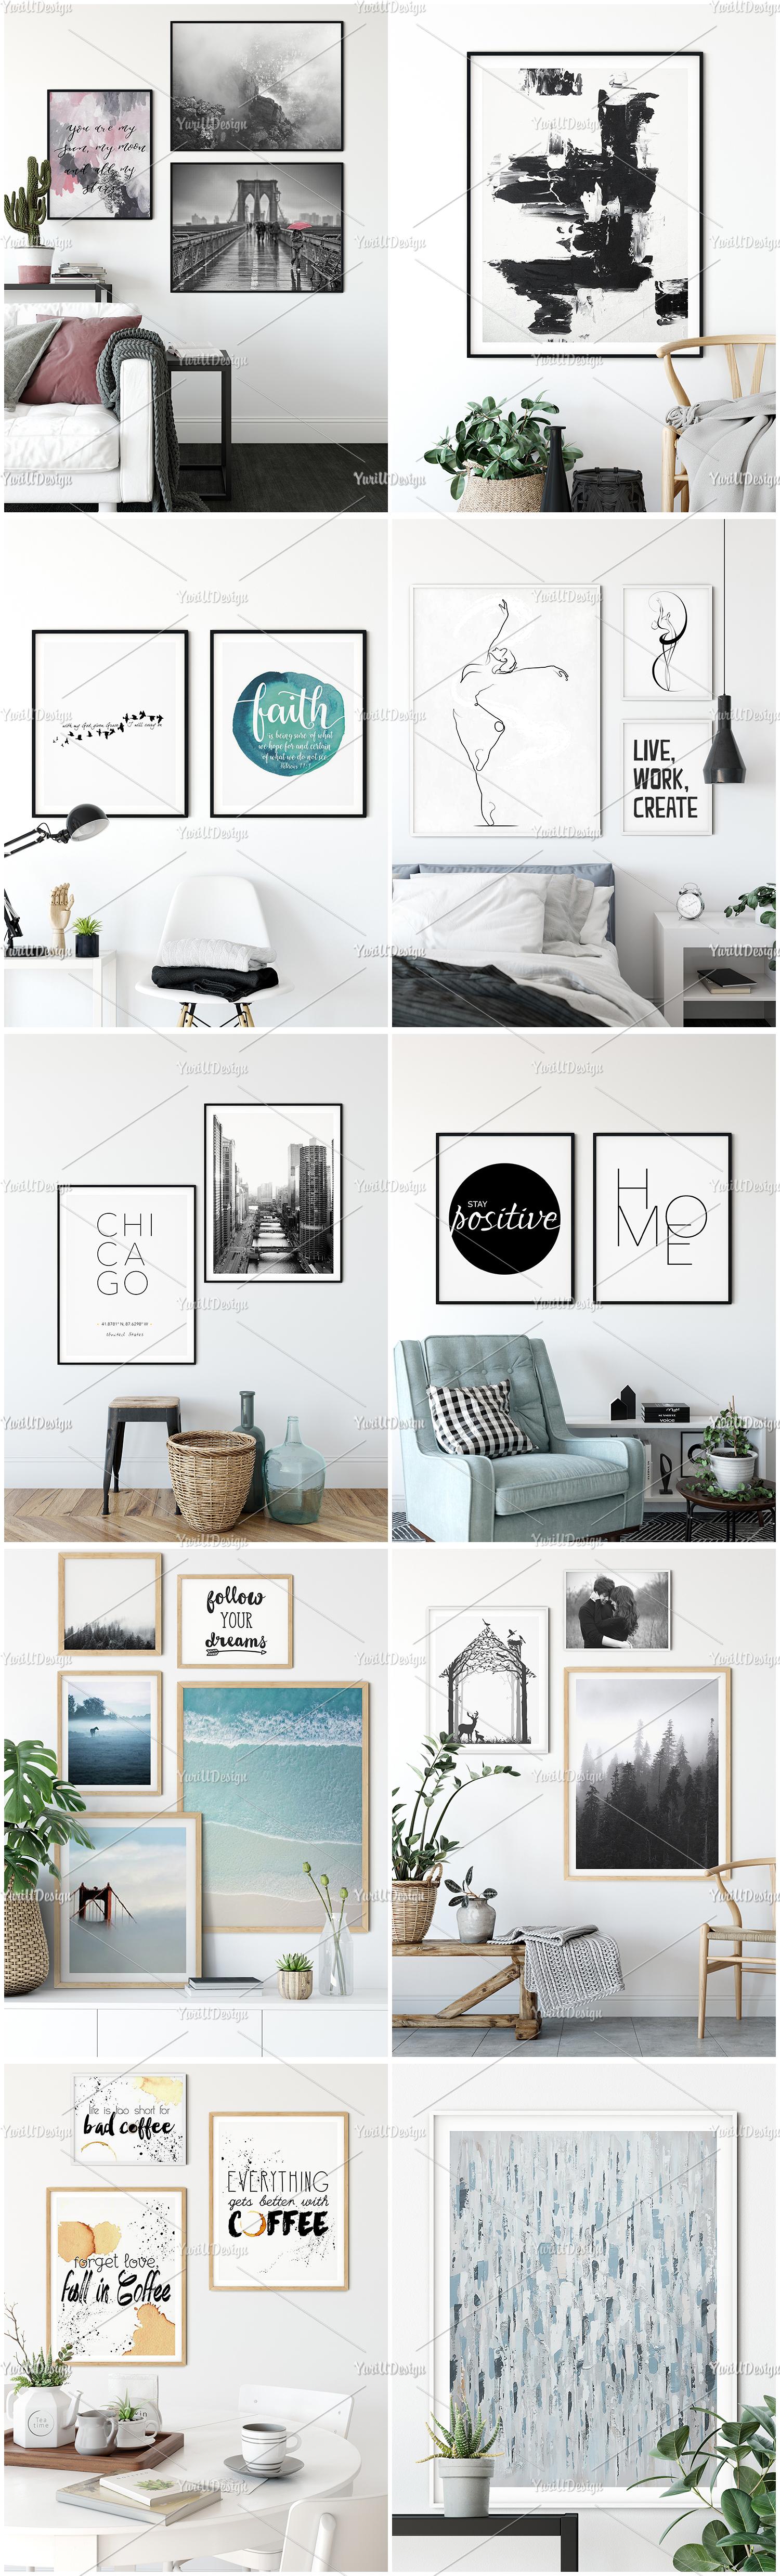 Scandinavian Interior Frames & Walls Mockup Bundle example image 6